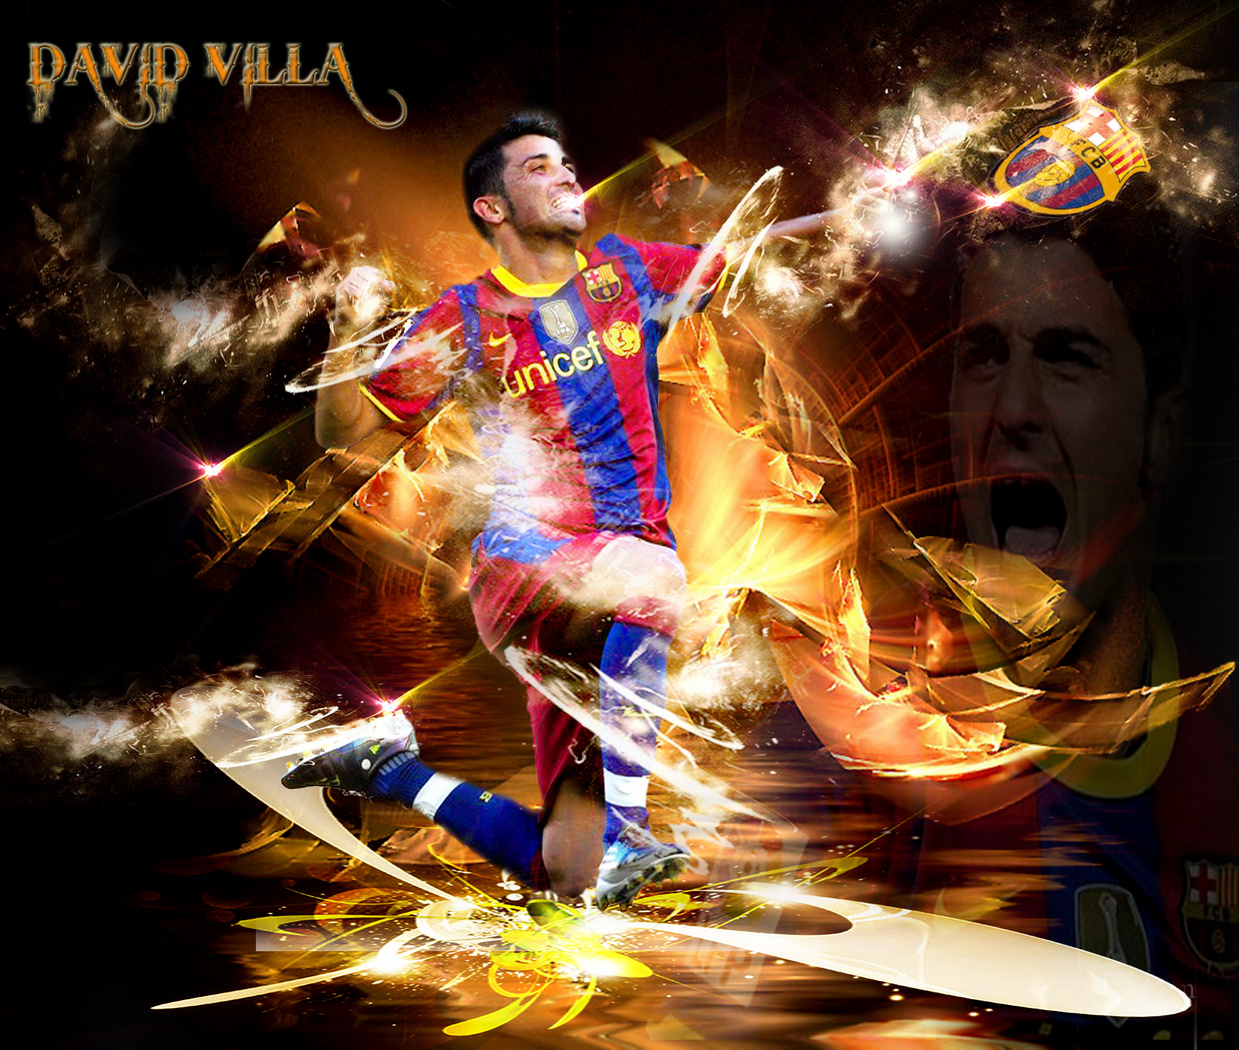 http://4.bp.blogspot.com/-SD278uY27yQ/Tq-uTrZx5OI/AAAAAAAAIzs/D6t1UHFnE4w/s1600/football_wallpaper_david_villa_03.jpg